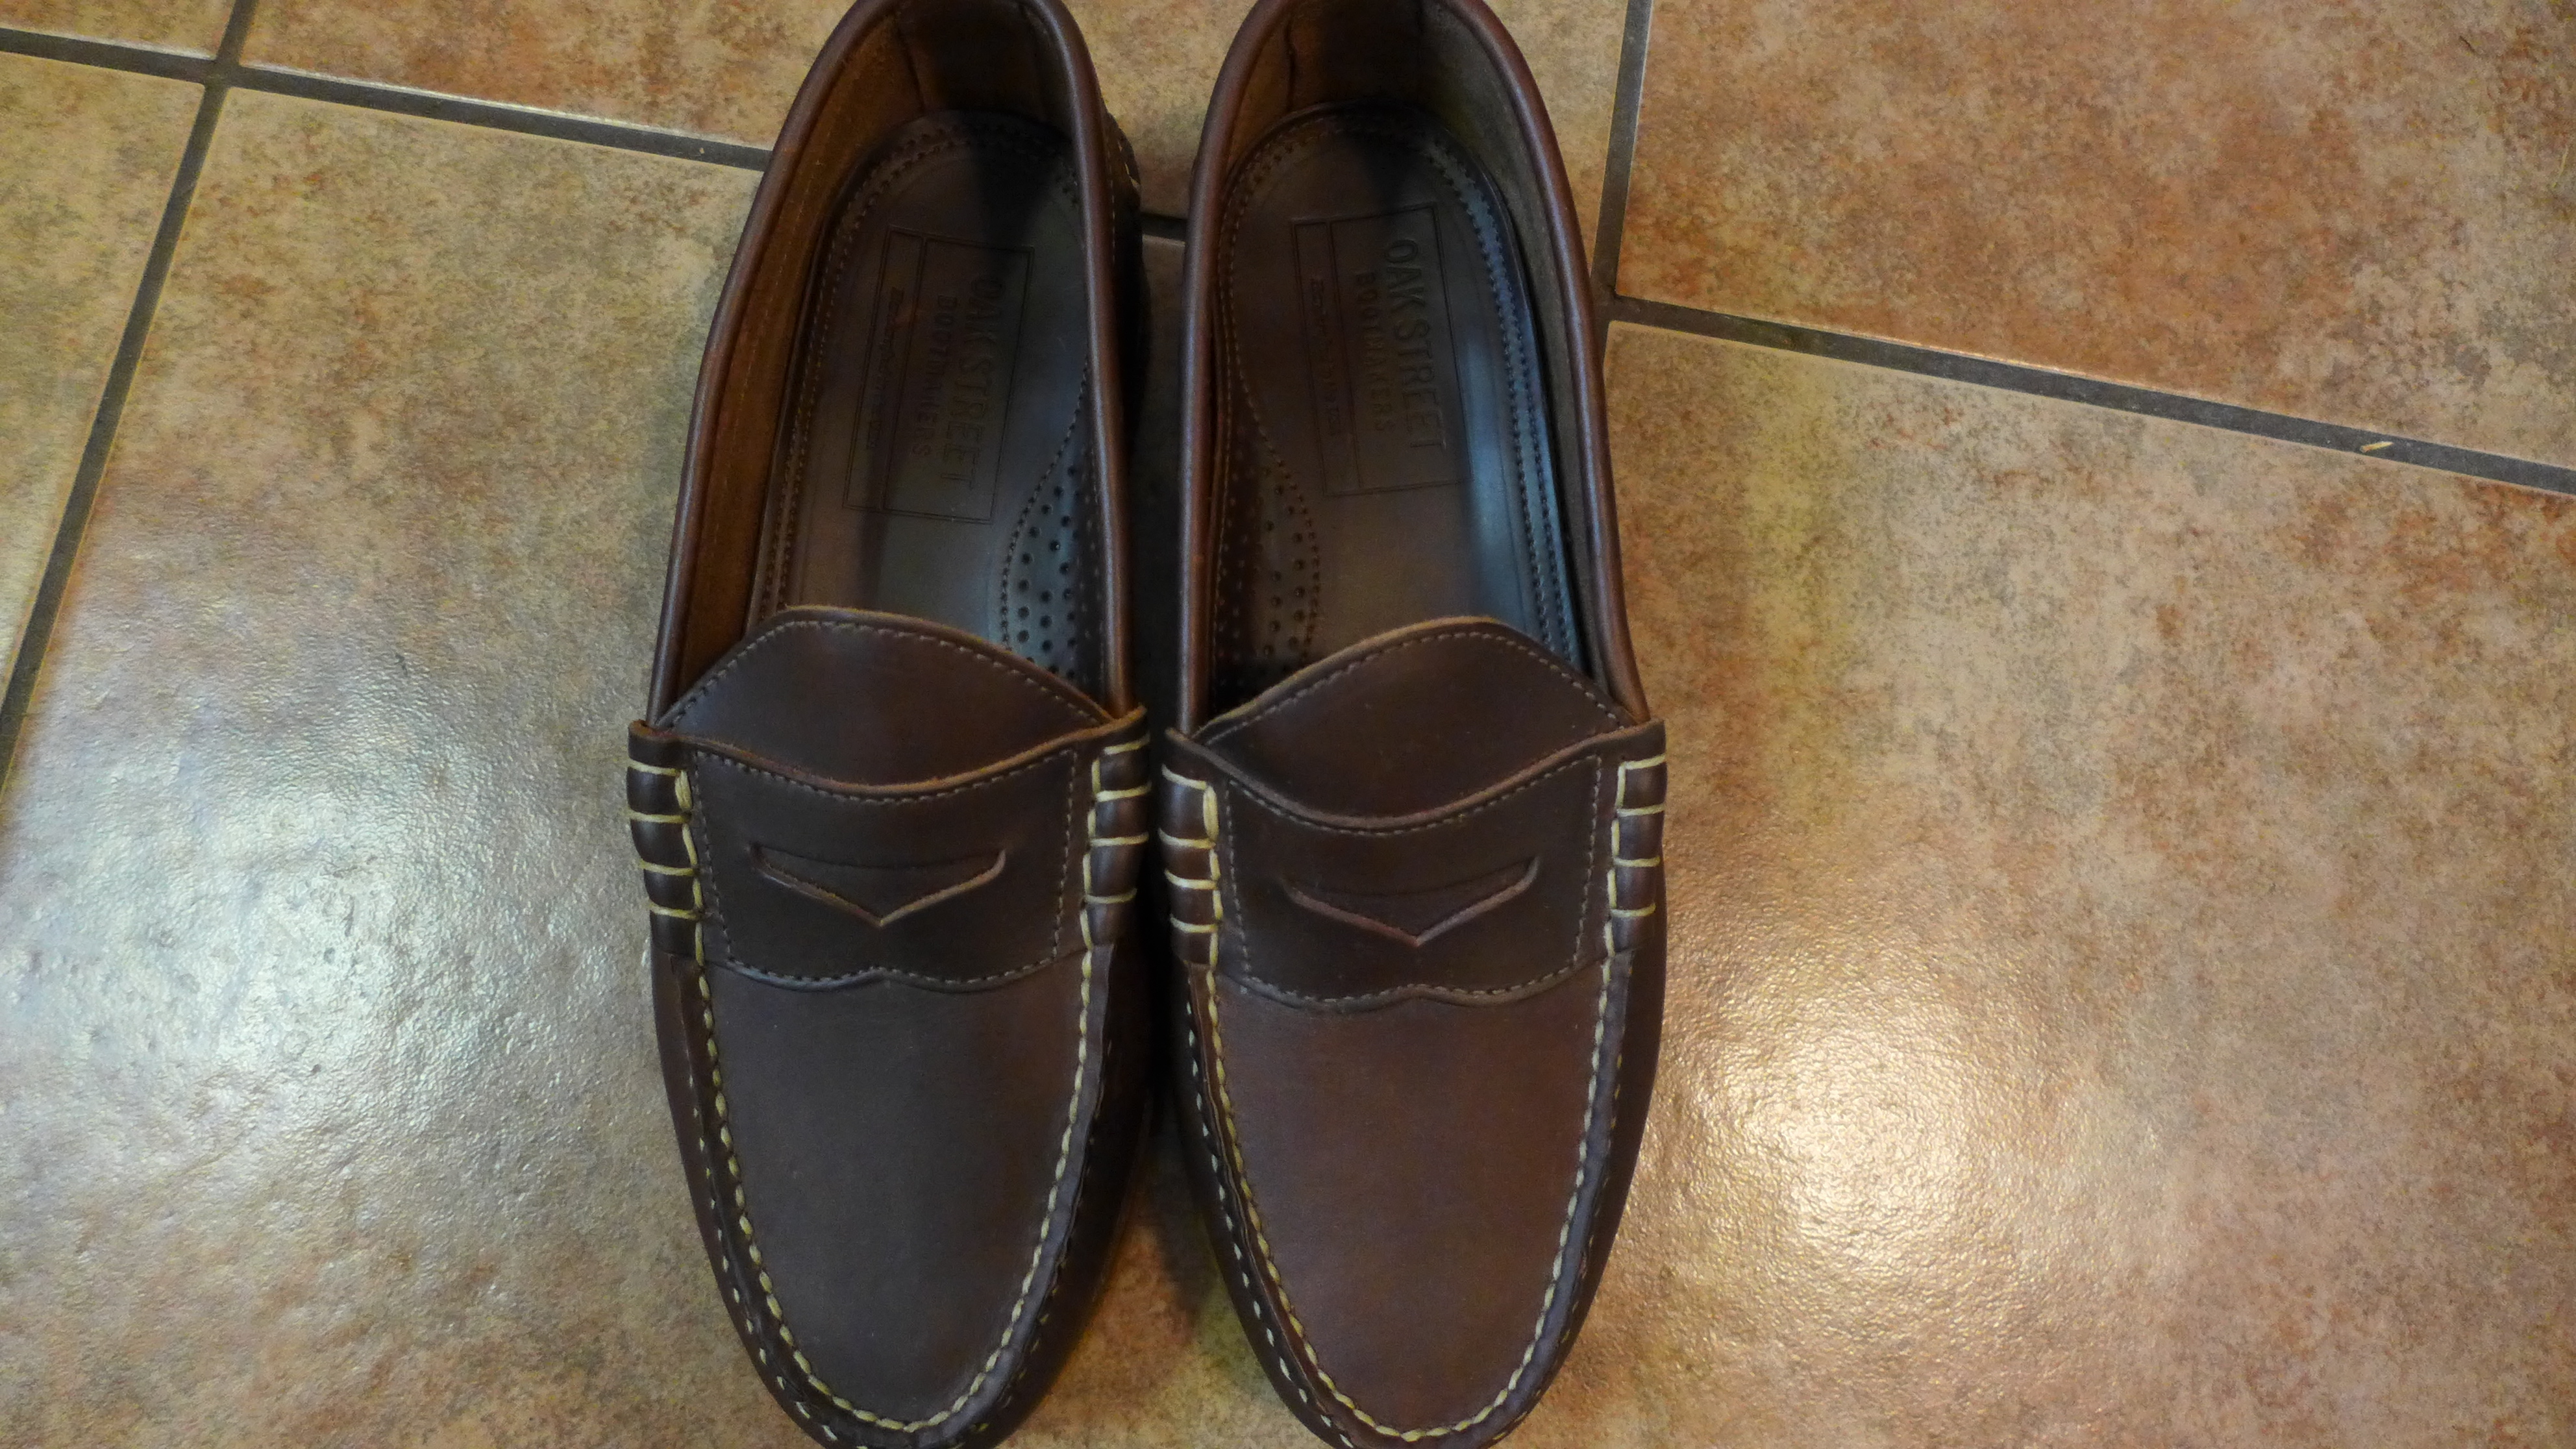 469cd3a6664 Oak Street Bootmakers Beefroll Penny Loafer